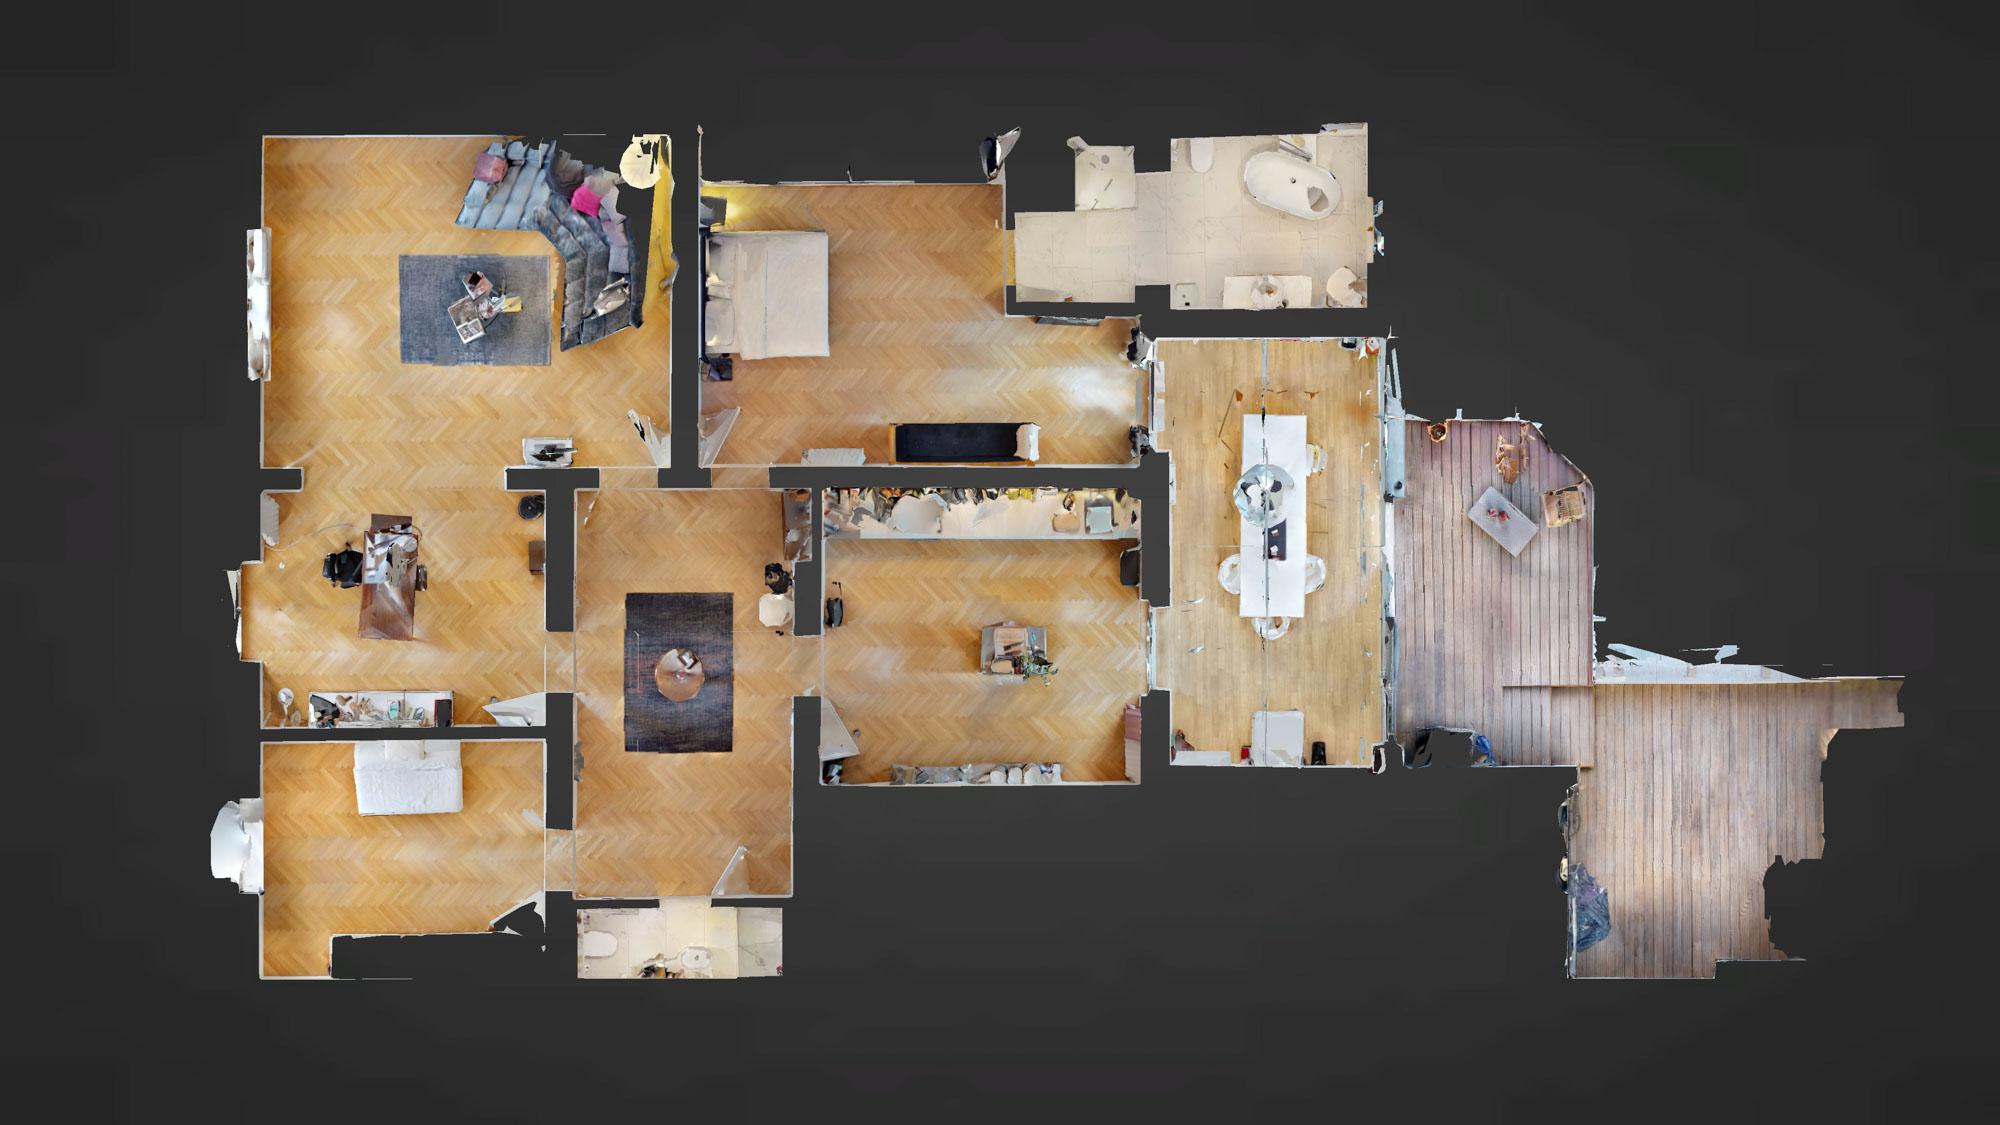 Luxuriöses 200qm Apartment in Oberkassel